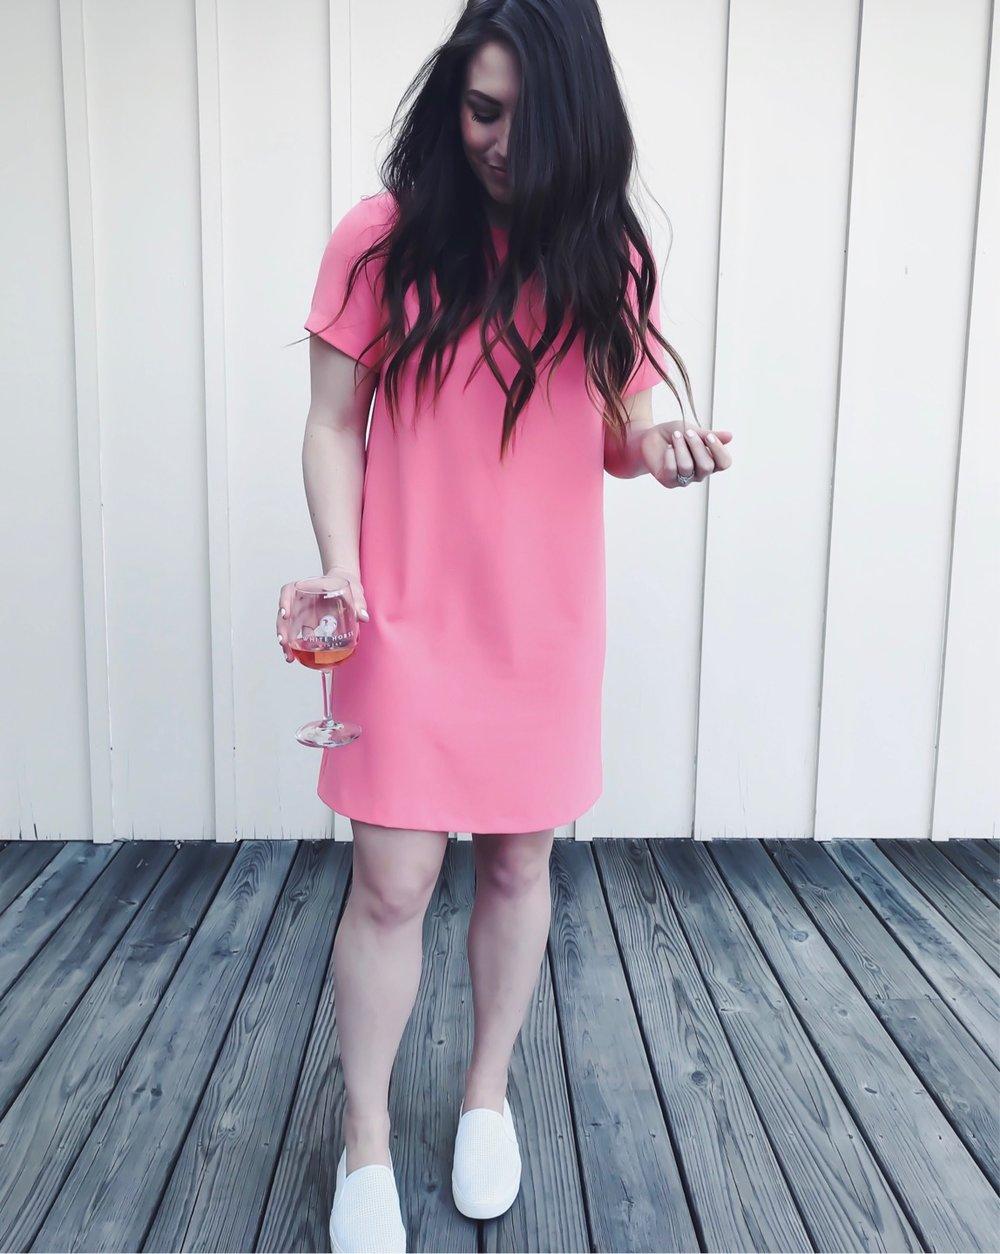 Instagram Round Up | Pine Barren Beauty | summer dress, summer outfit, easy summer look